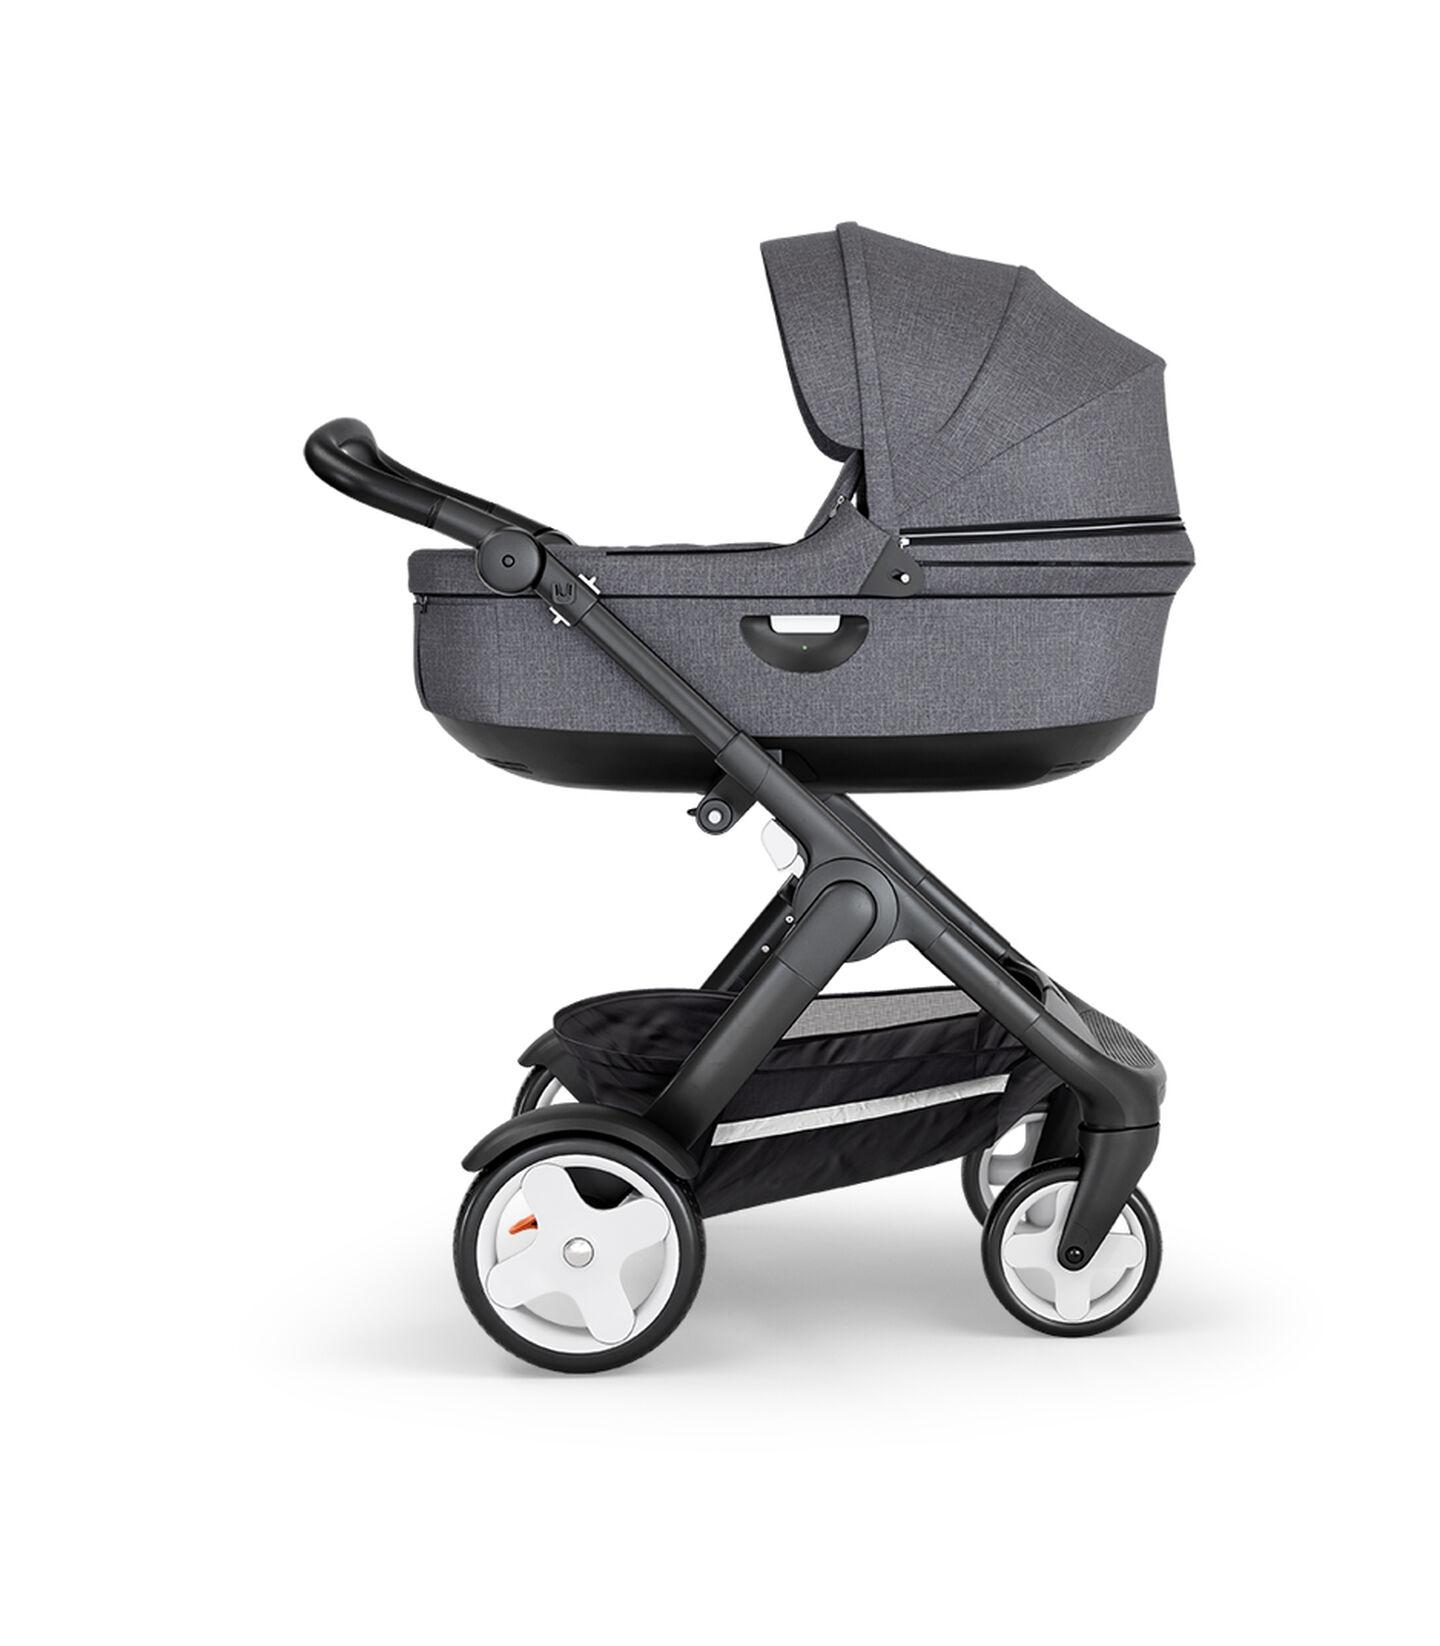 Stokke® Trailz™ with Black Chassis, Black Leatherette and Classic Wheels. Stokke® Stroller Carry Cot, Black Melange.